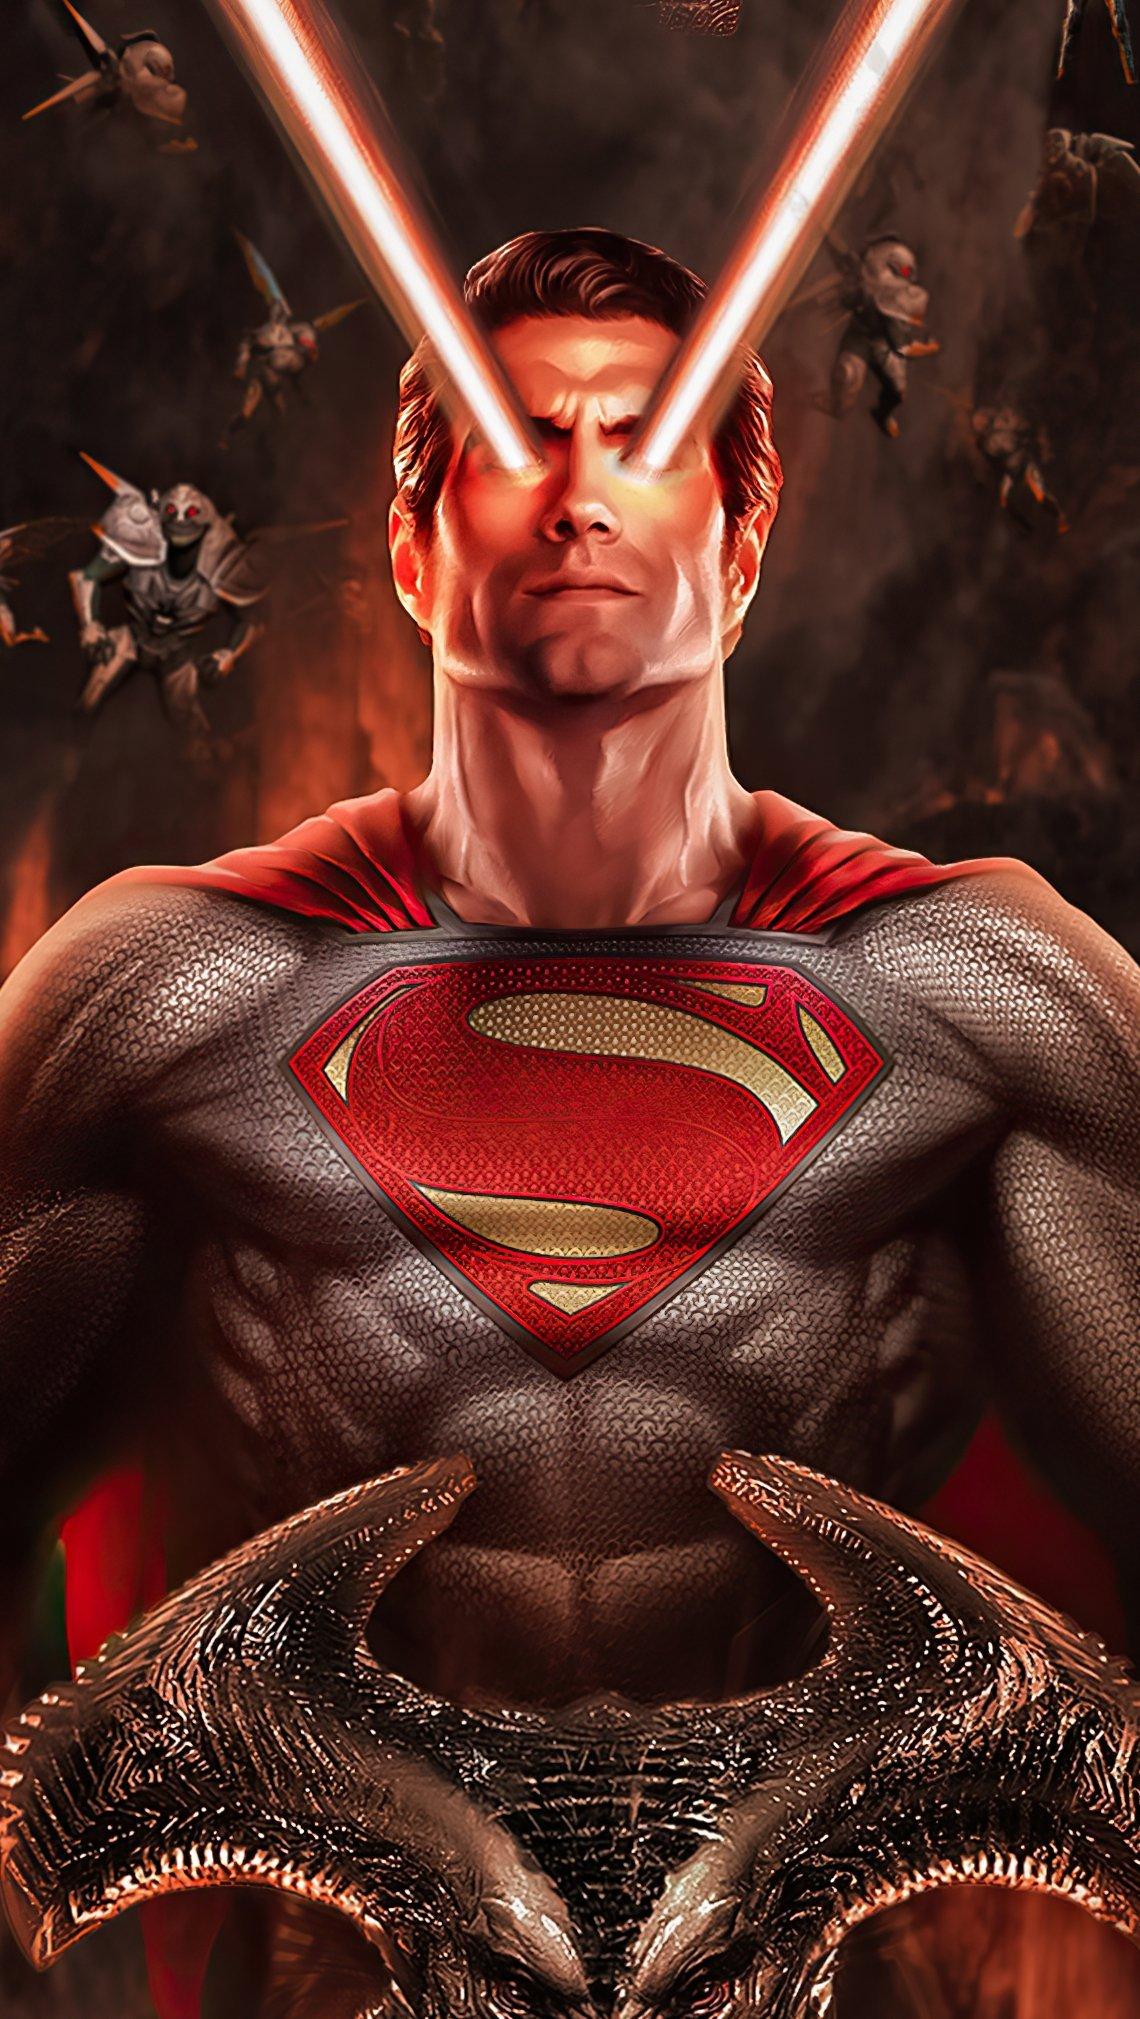 Fondos de pantalla Superman con laser en ojos Vertical